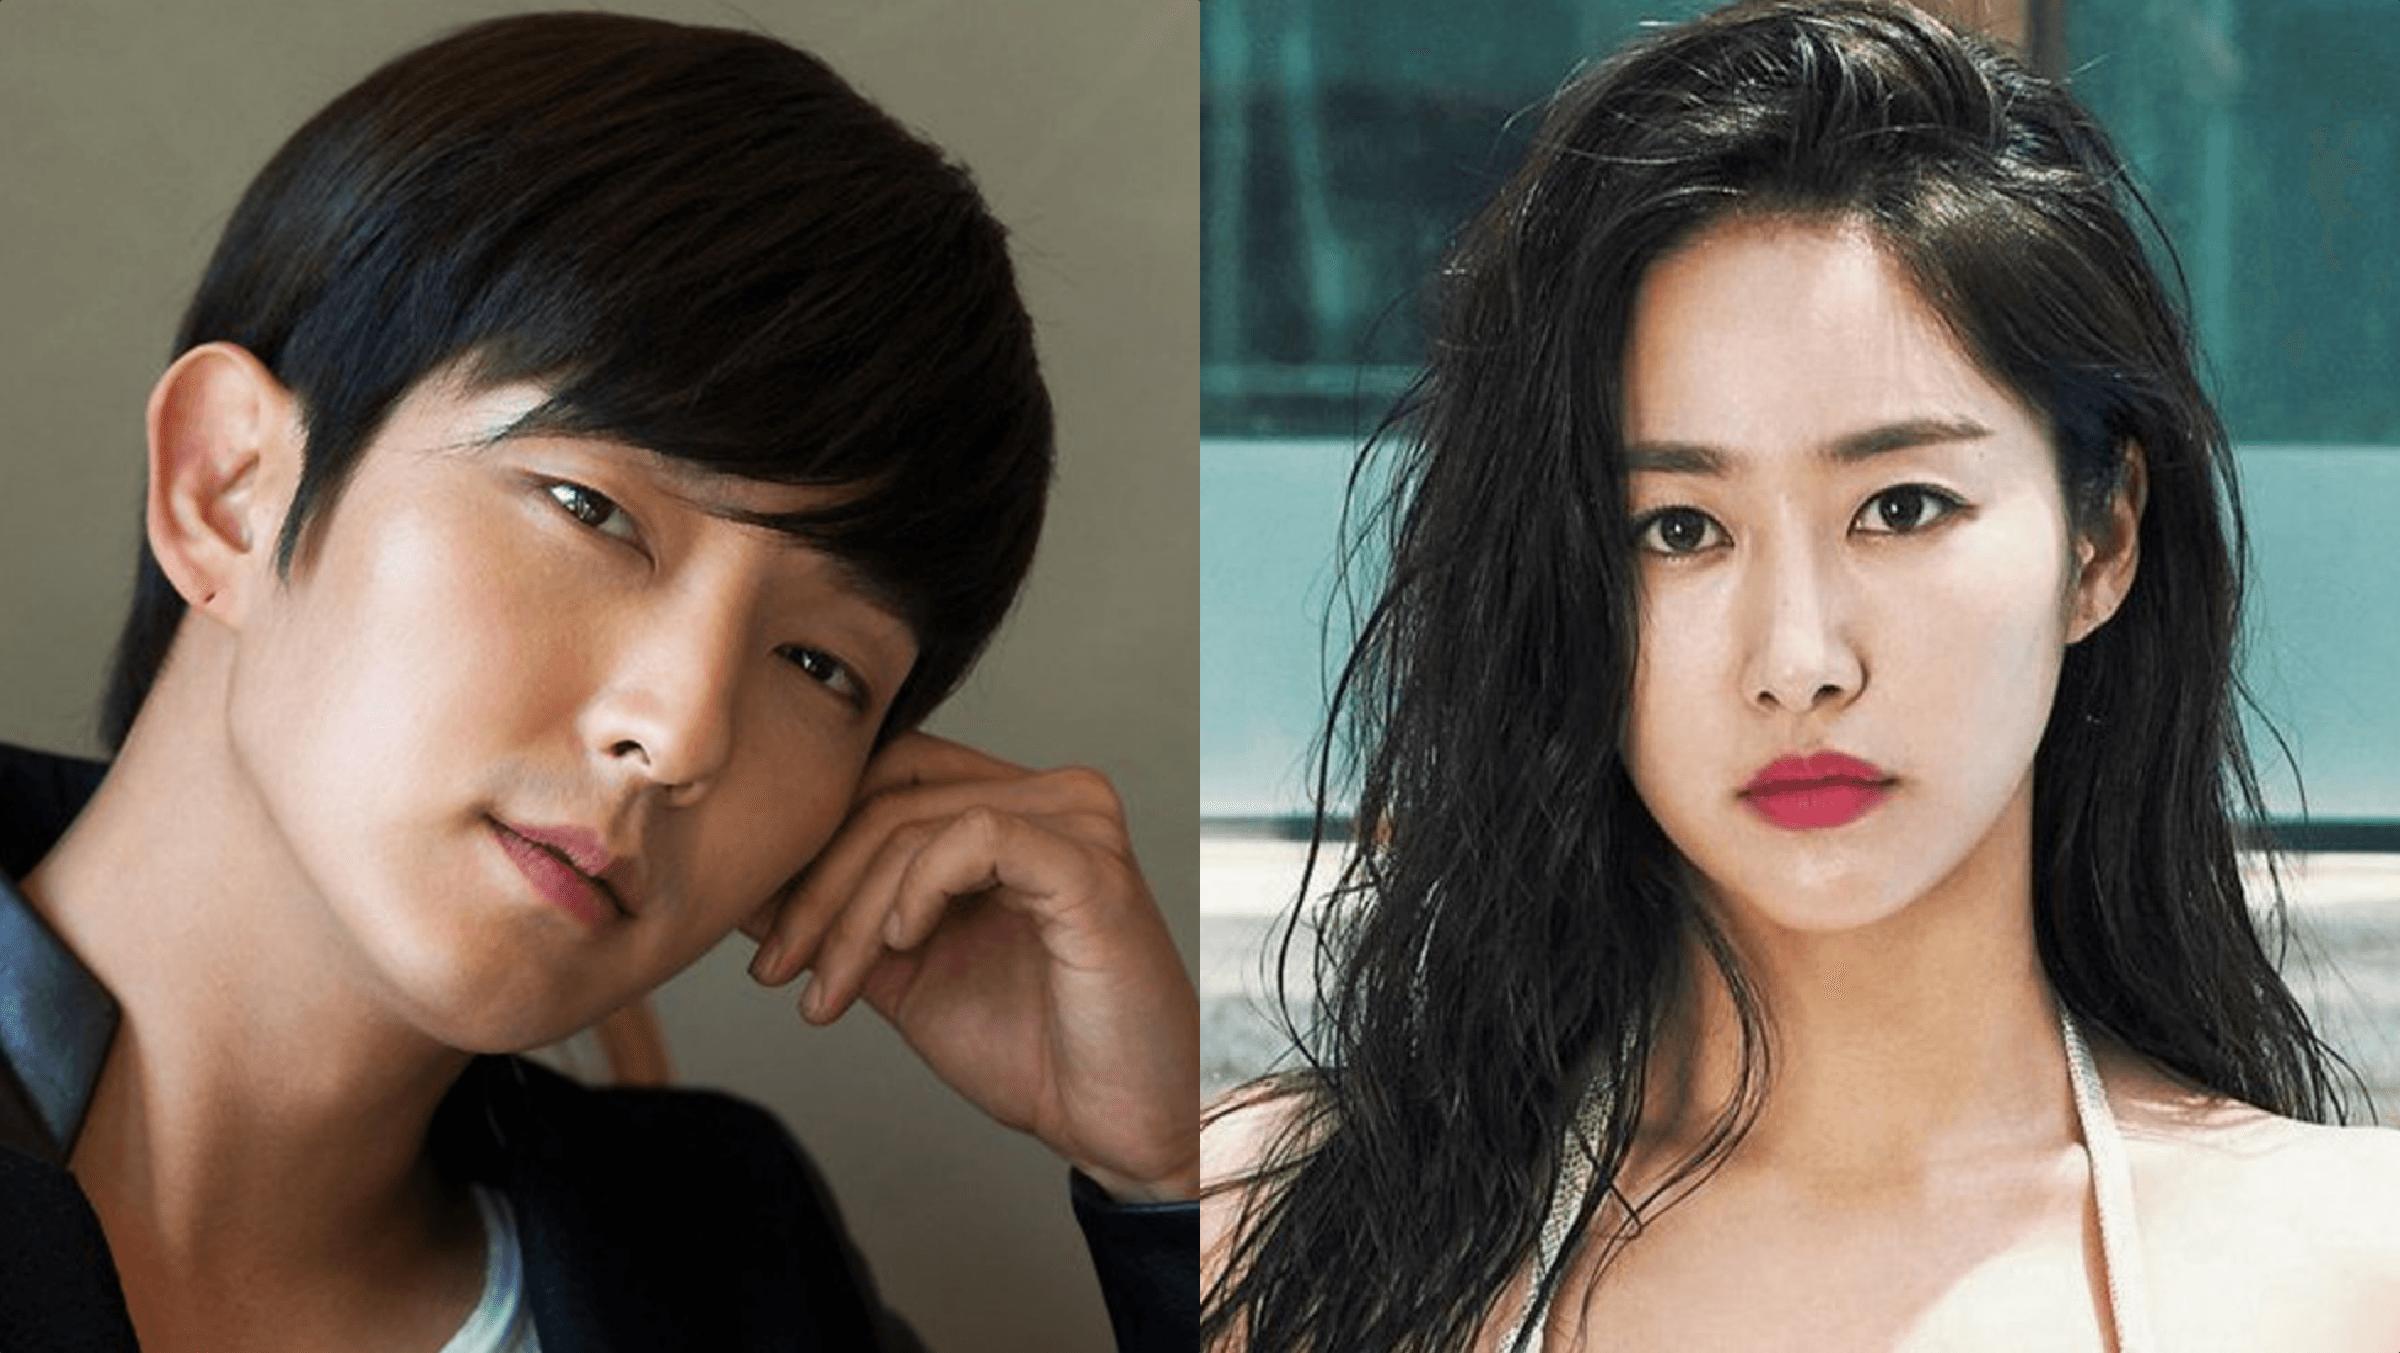 lee joon and sunhwa dating games